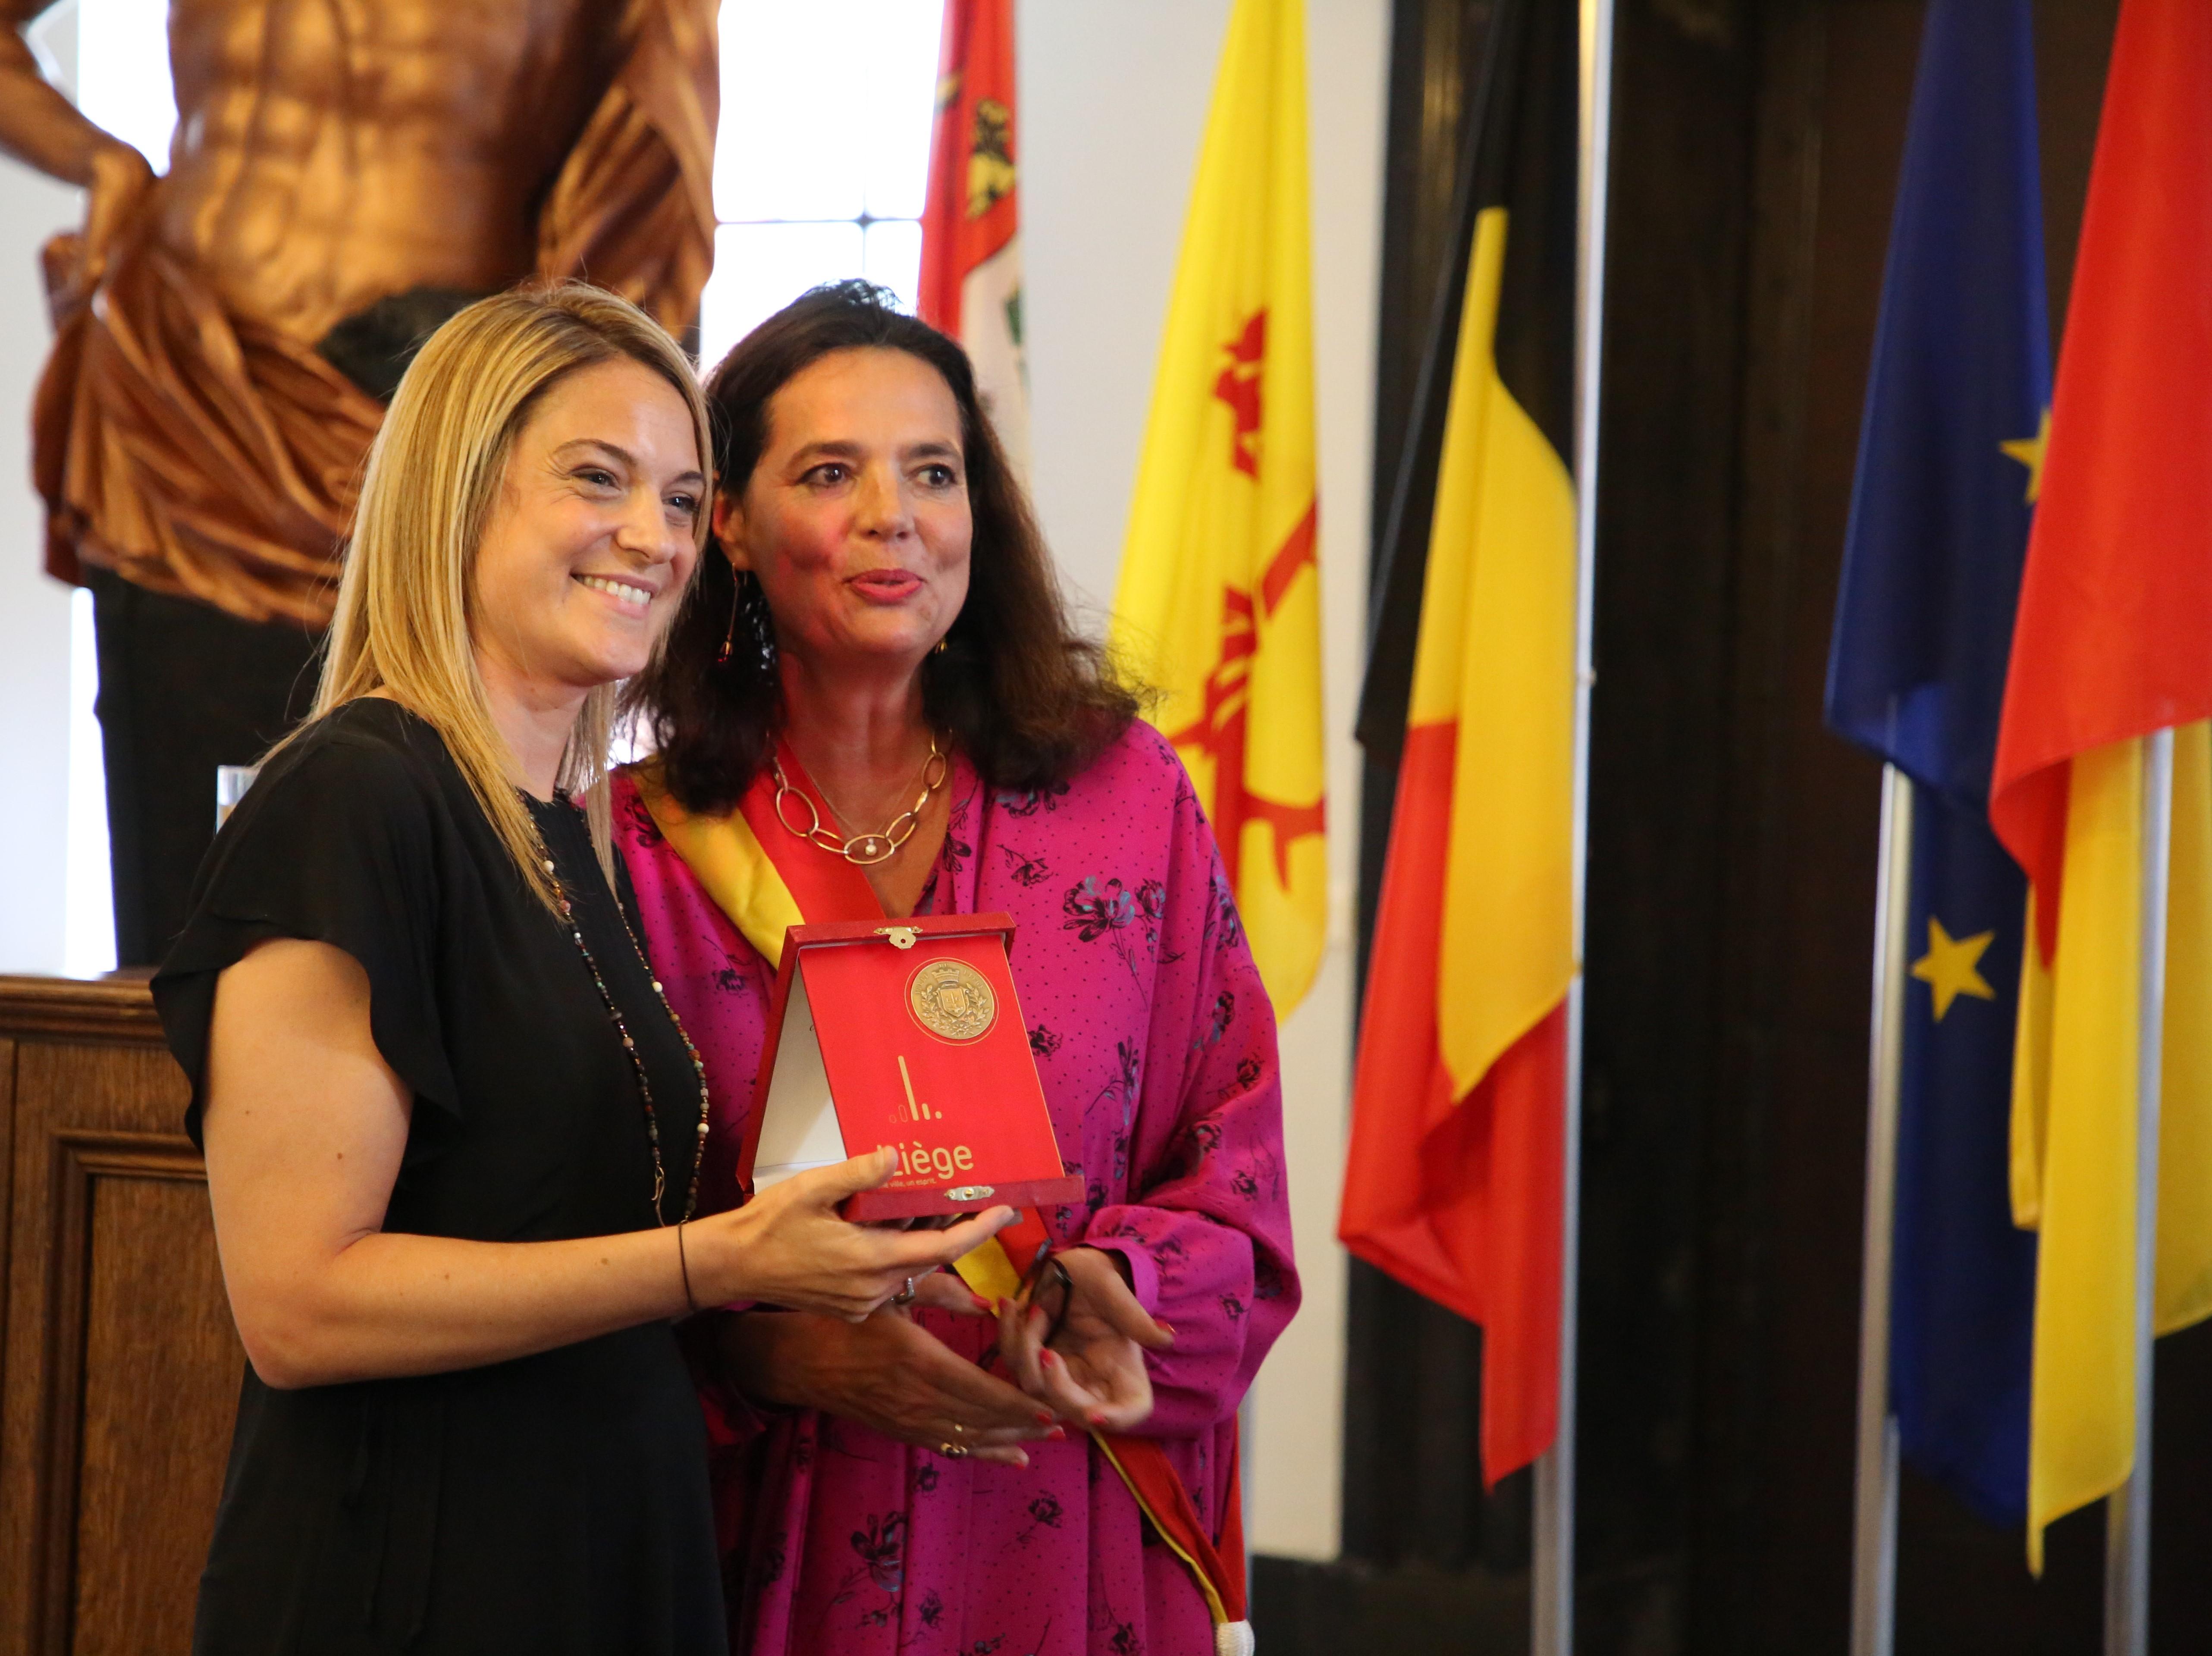 Nathalie Crutzen - citoyenne d'honneur Liege 2019